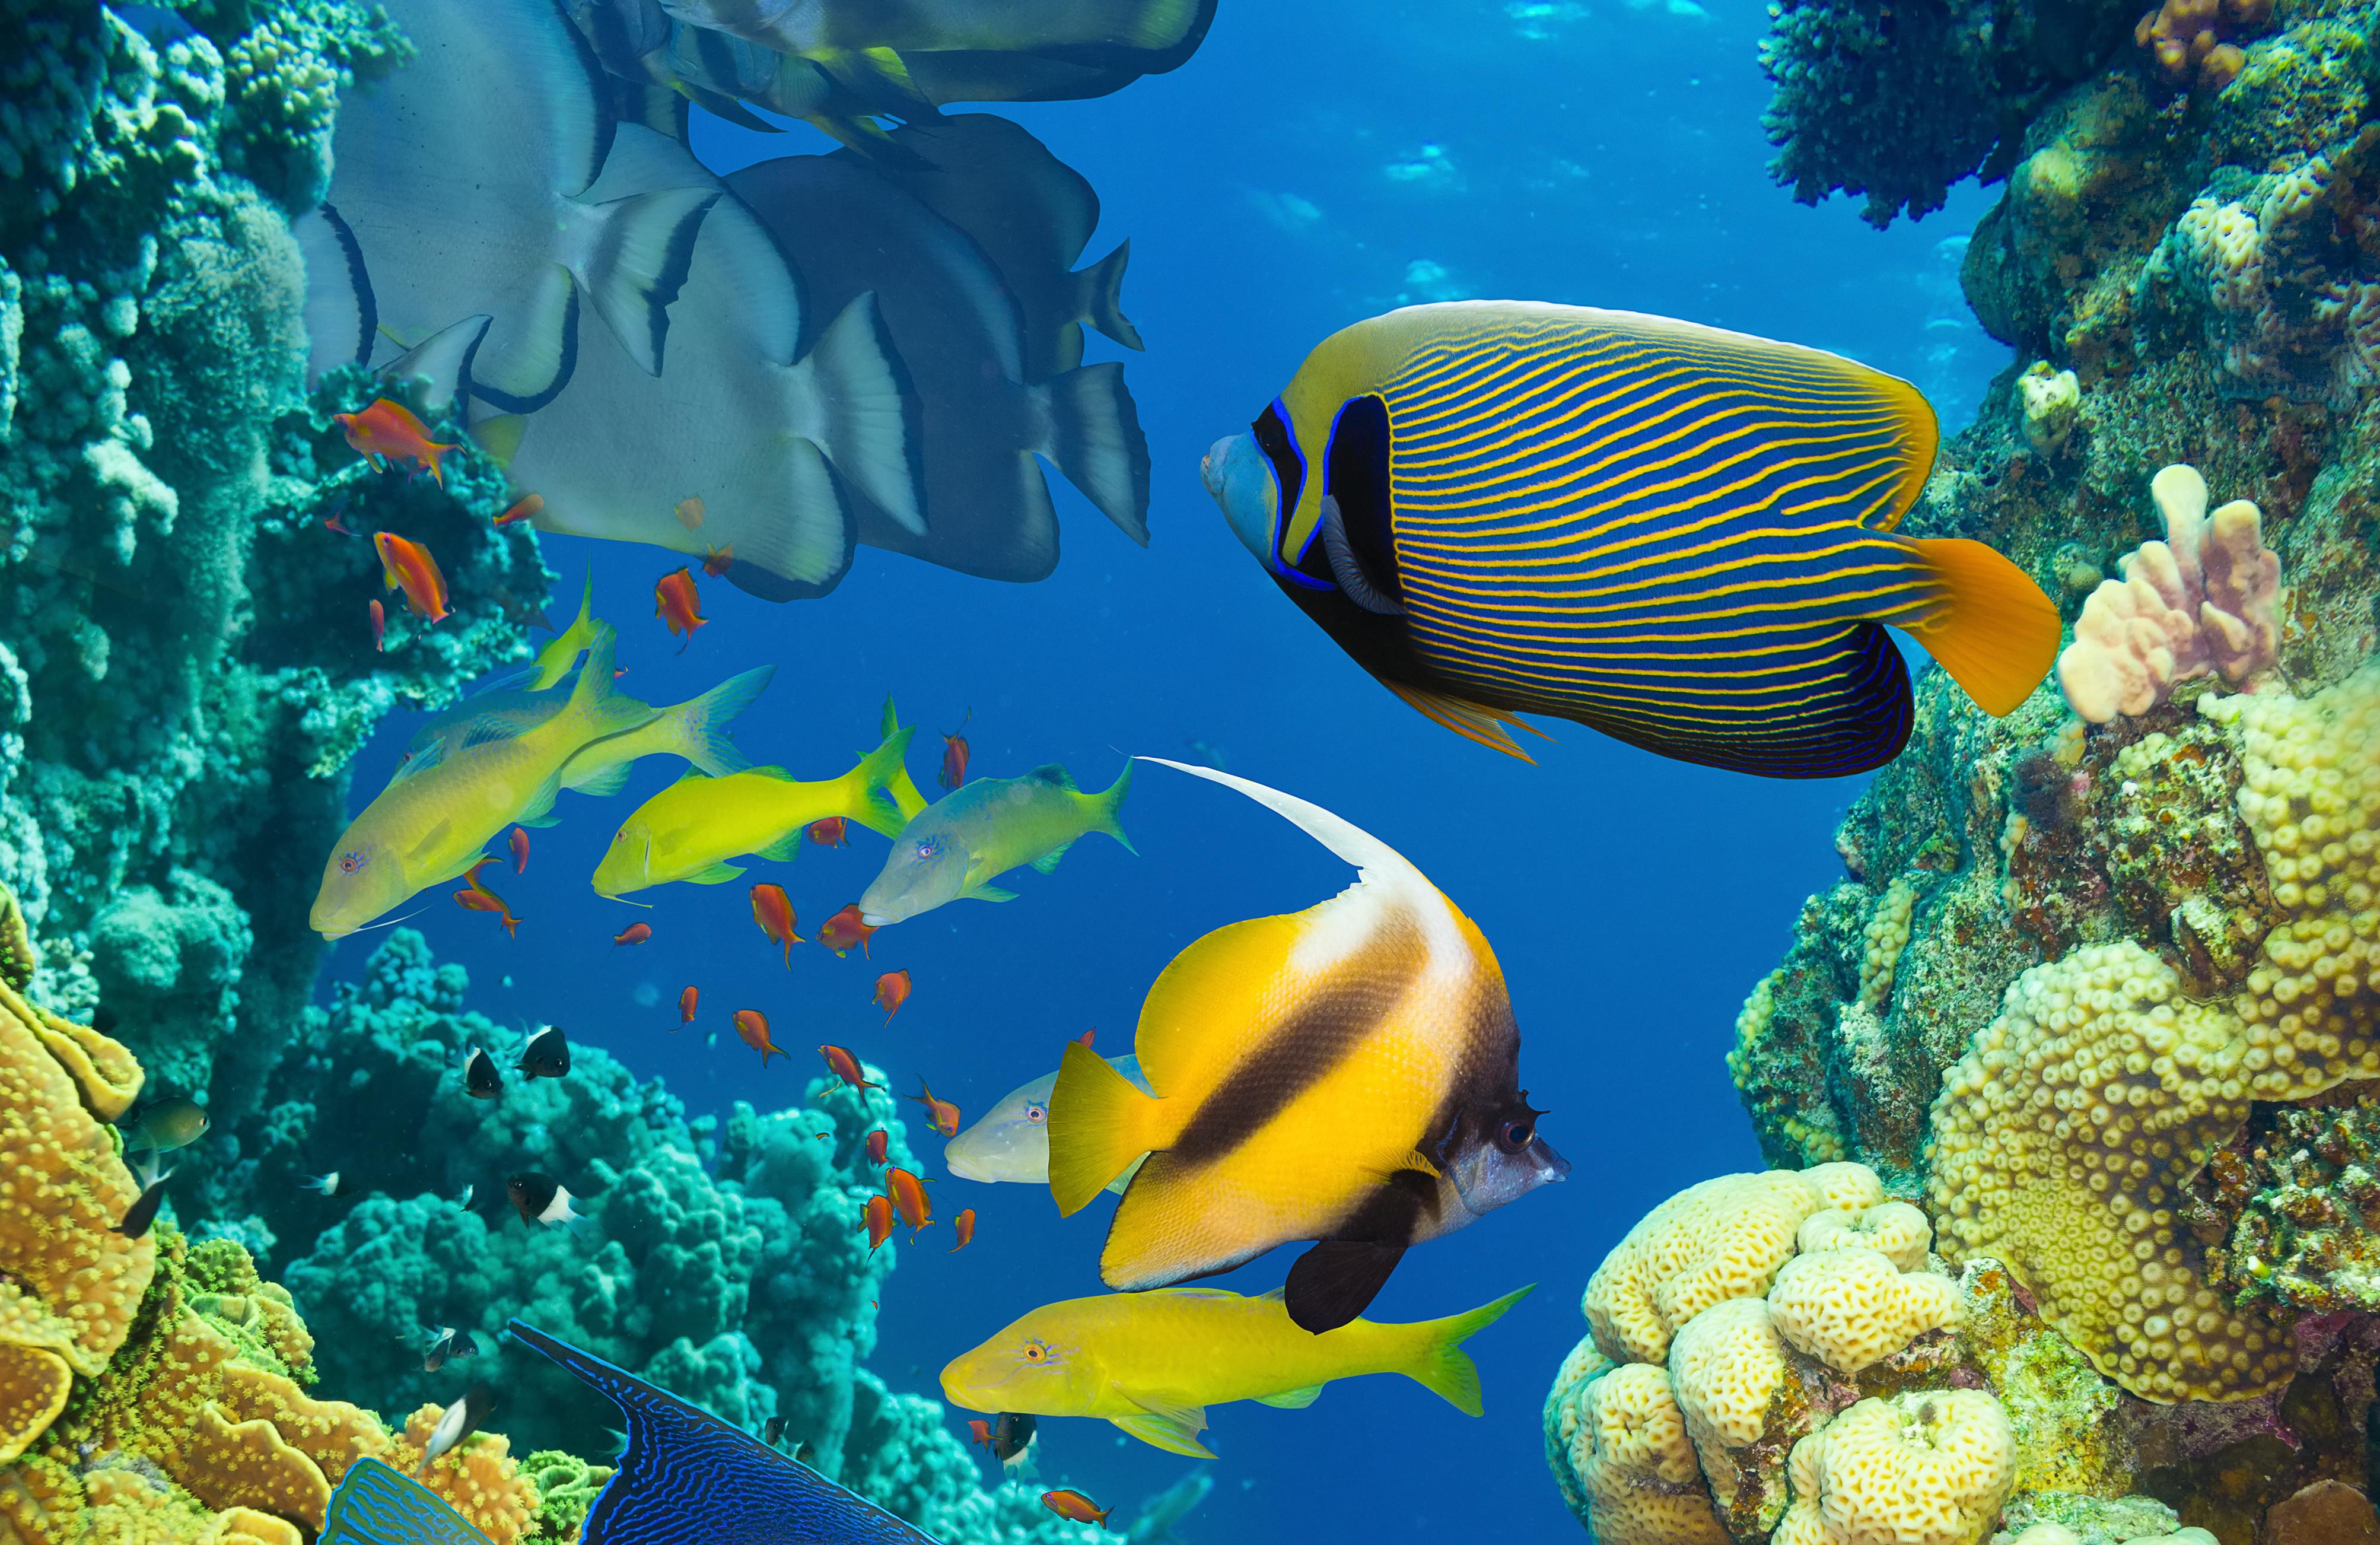 Fish 4k Ultra Hd Wallpaper Background Image 4012x2604 Id